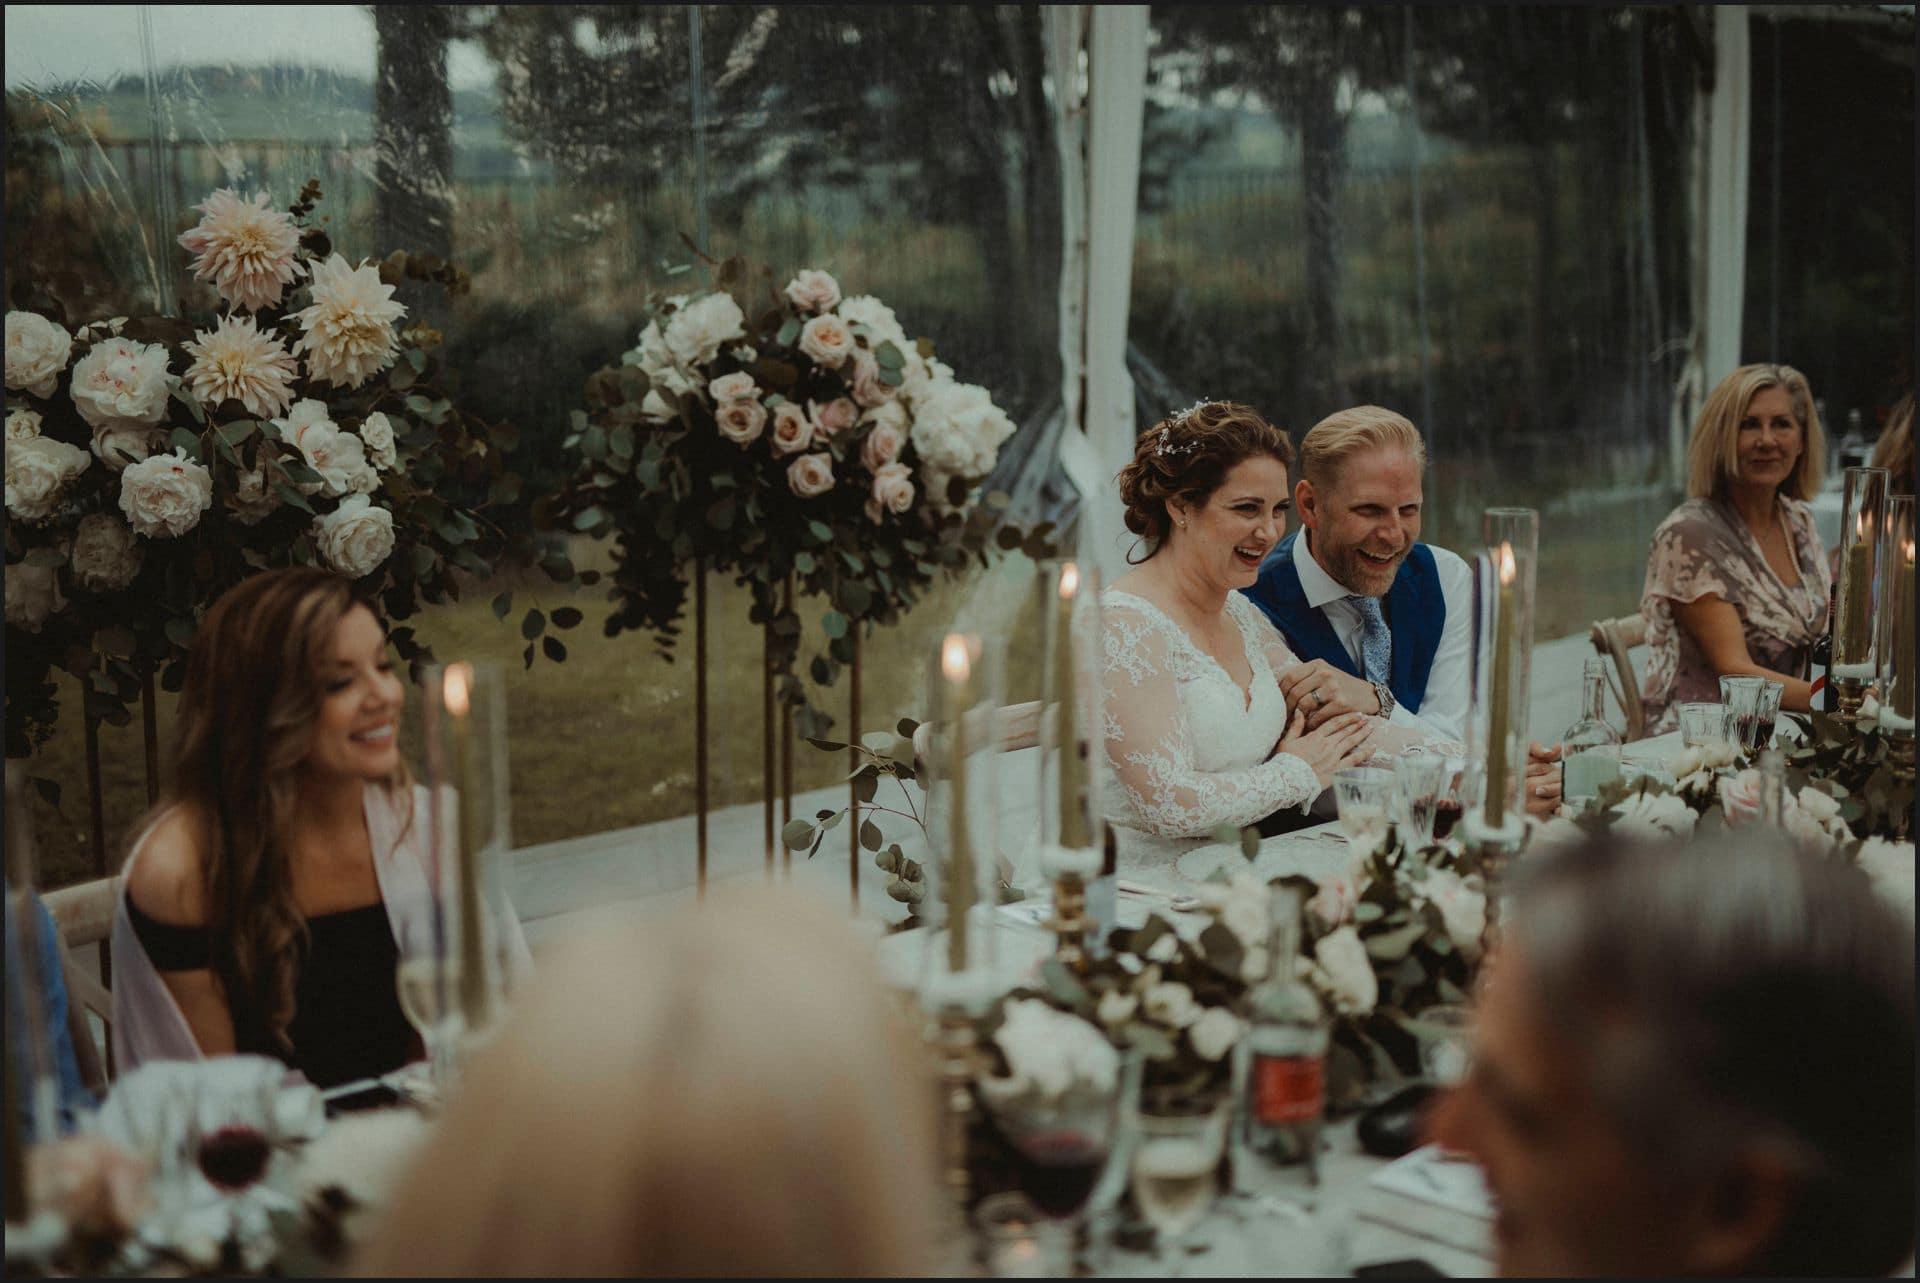 tuscany, destination wedding, chianti, bride, groom